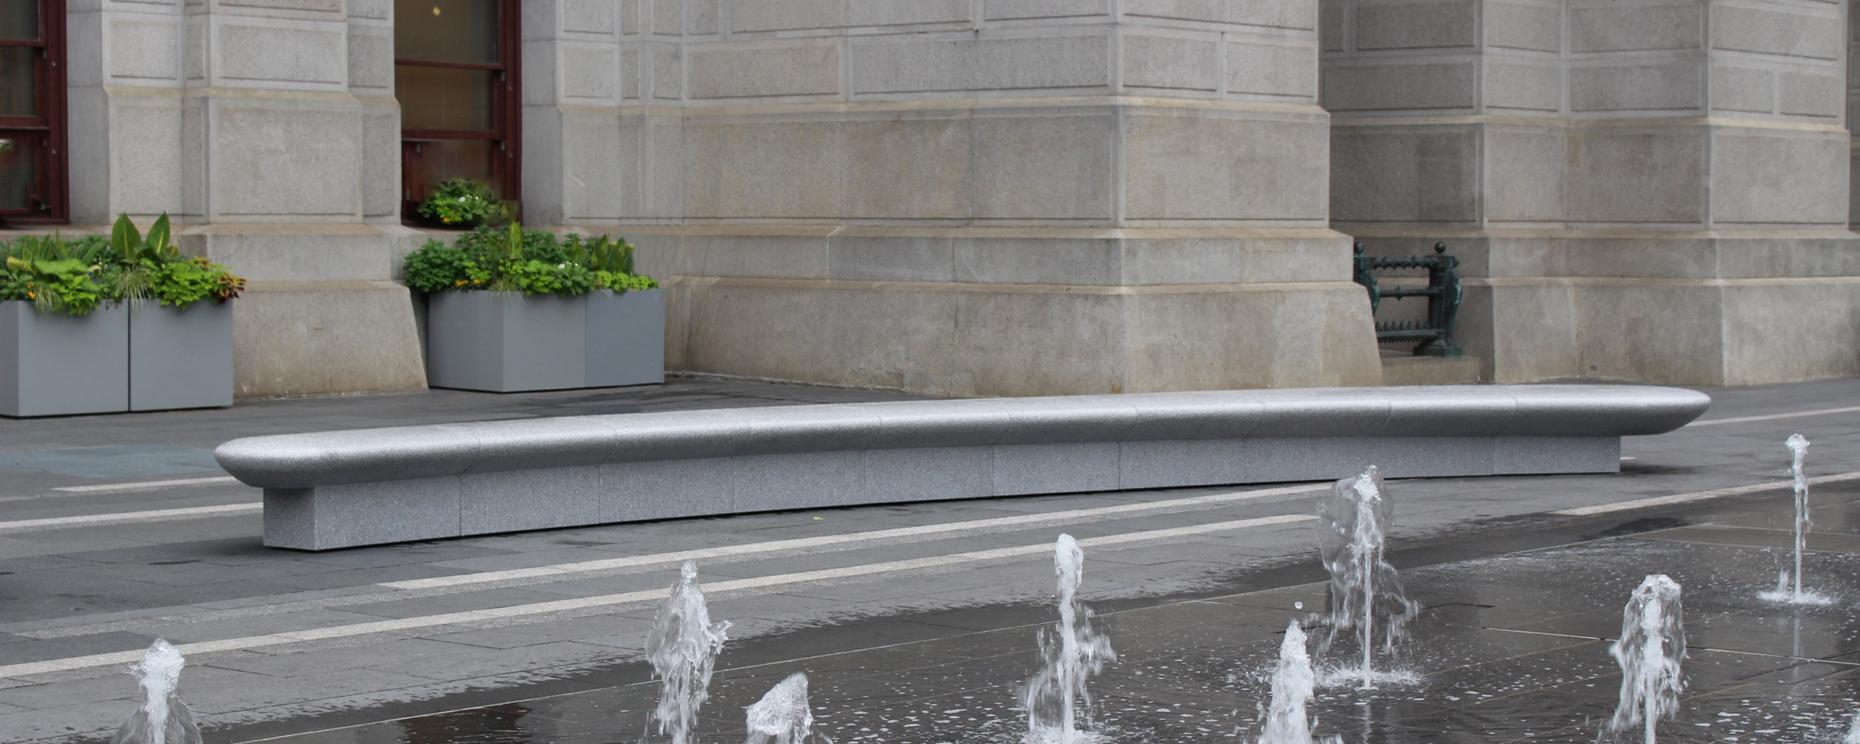 City Park Benches, Philadelphia, PA. Custom Thermoformed Corian Platinum Modular Benches